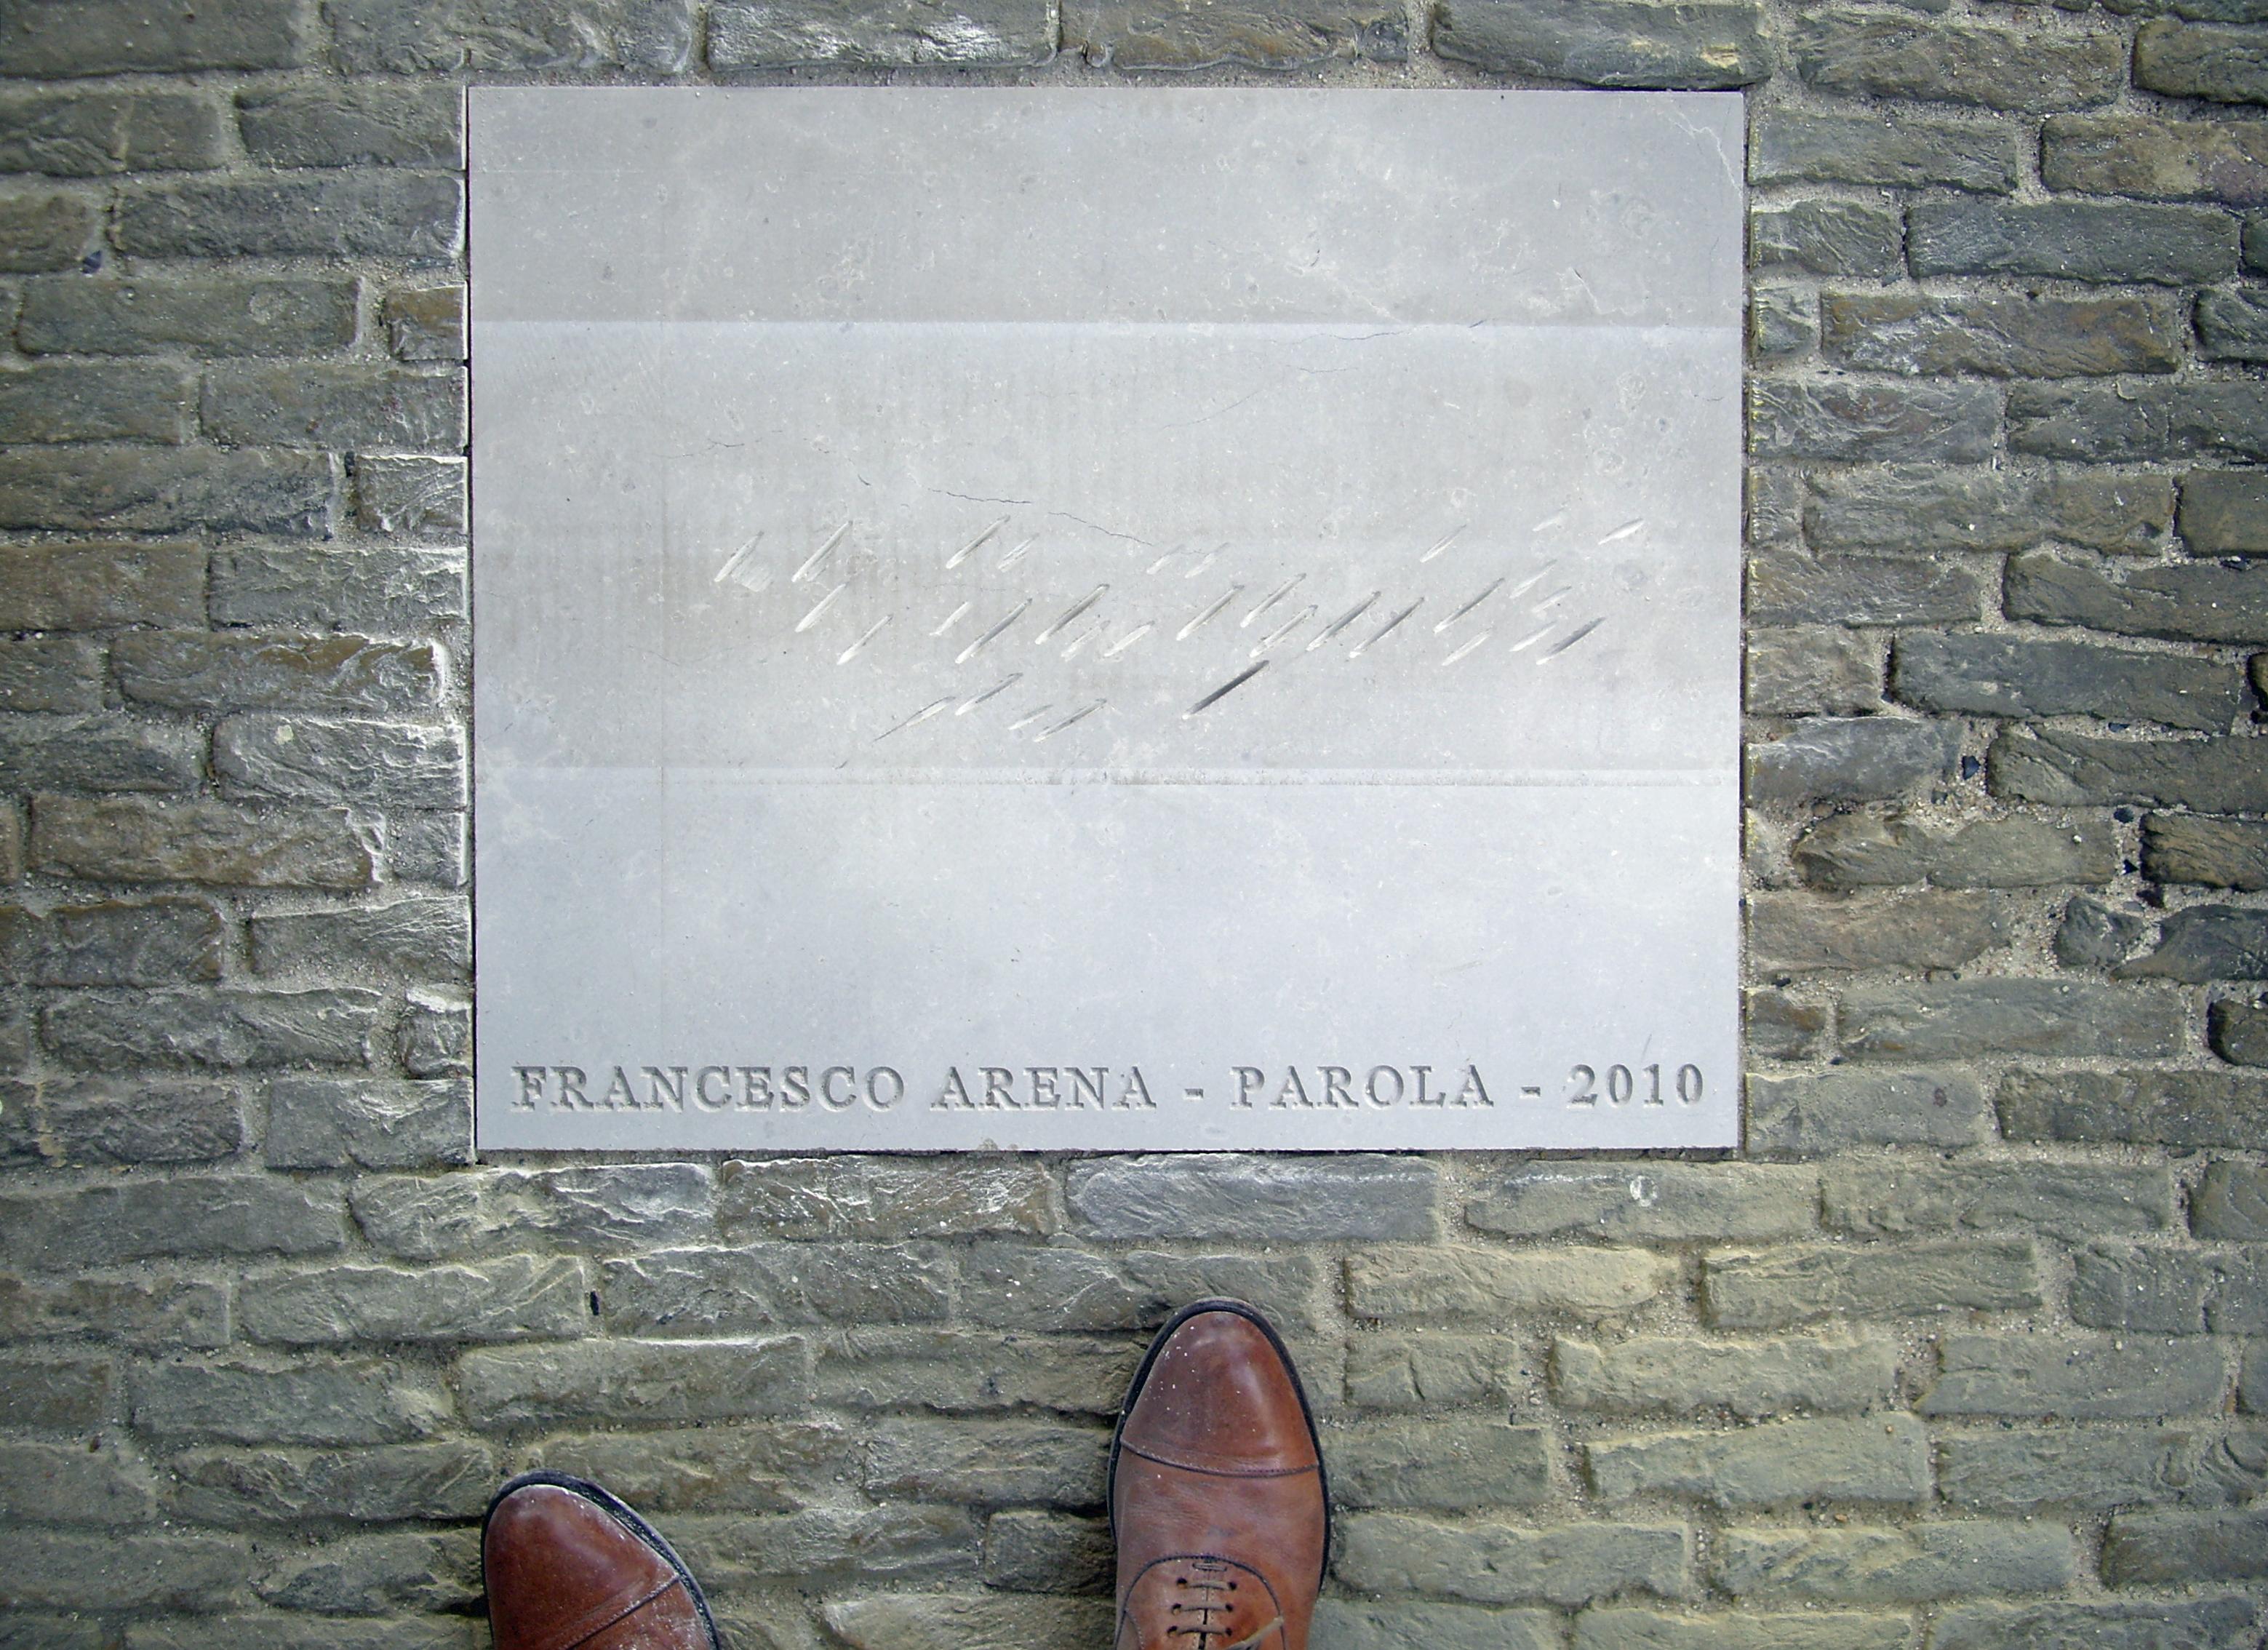 Parola (Matera), 2010